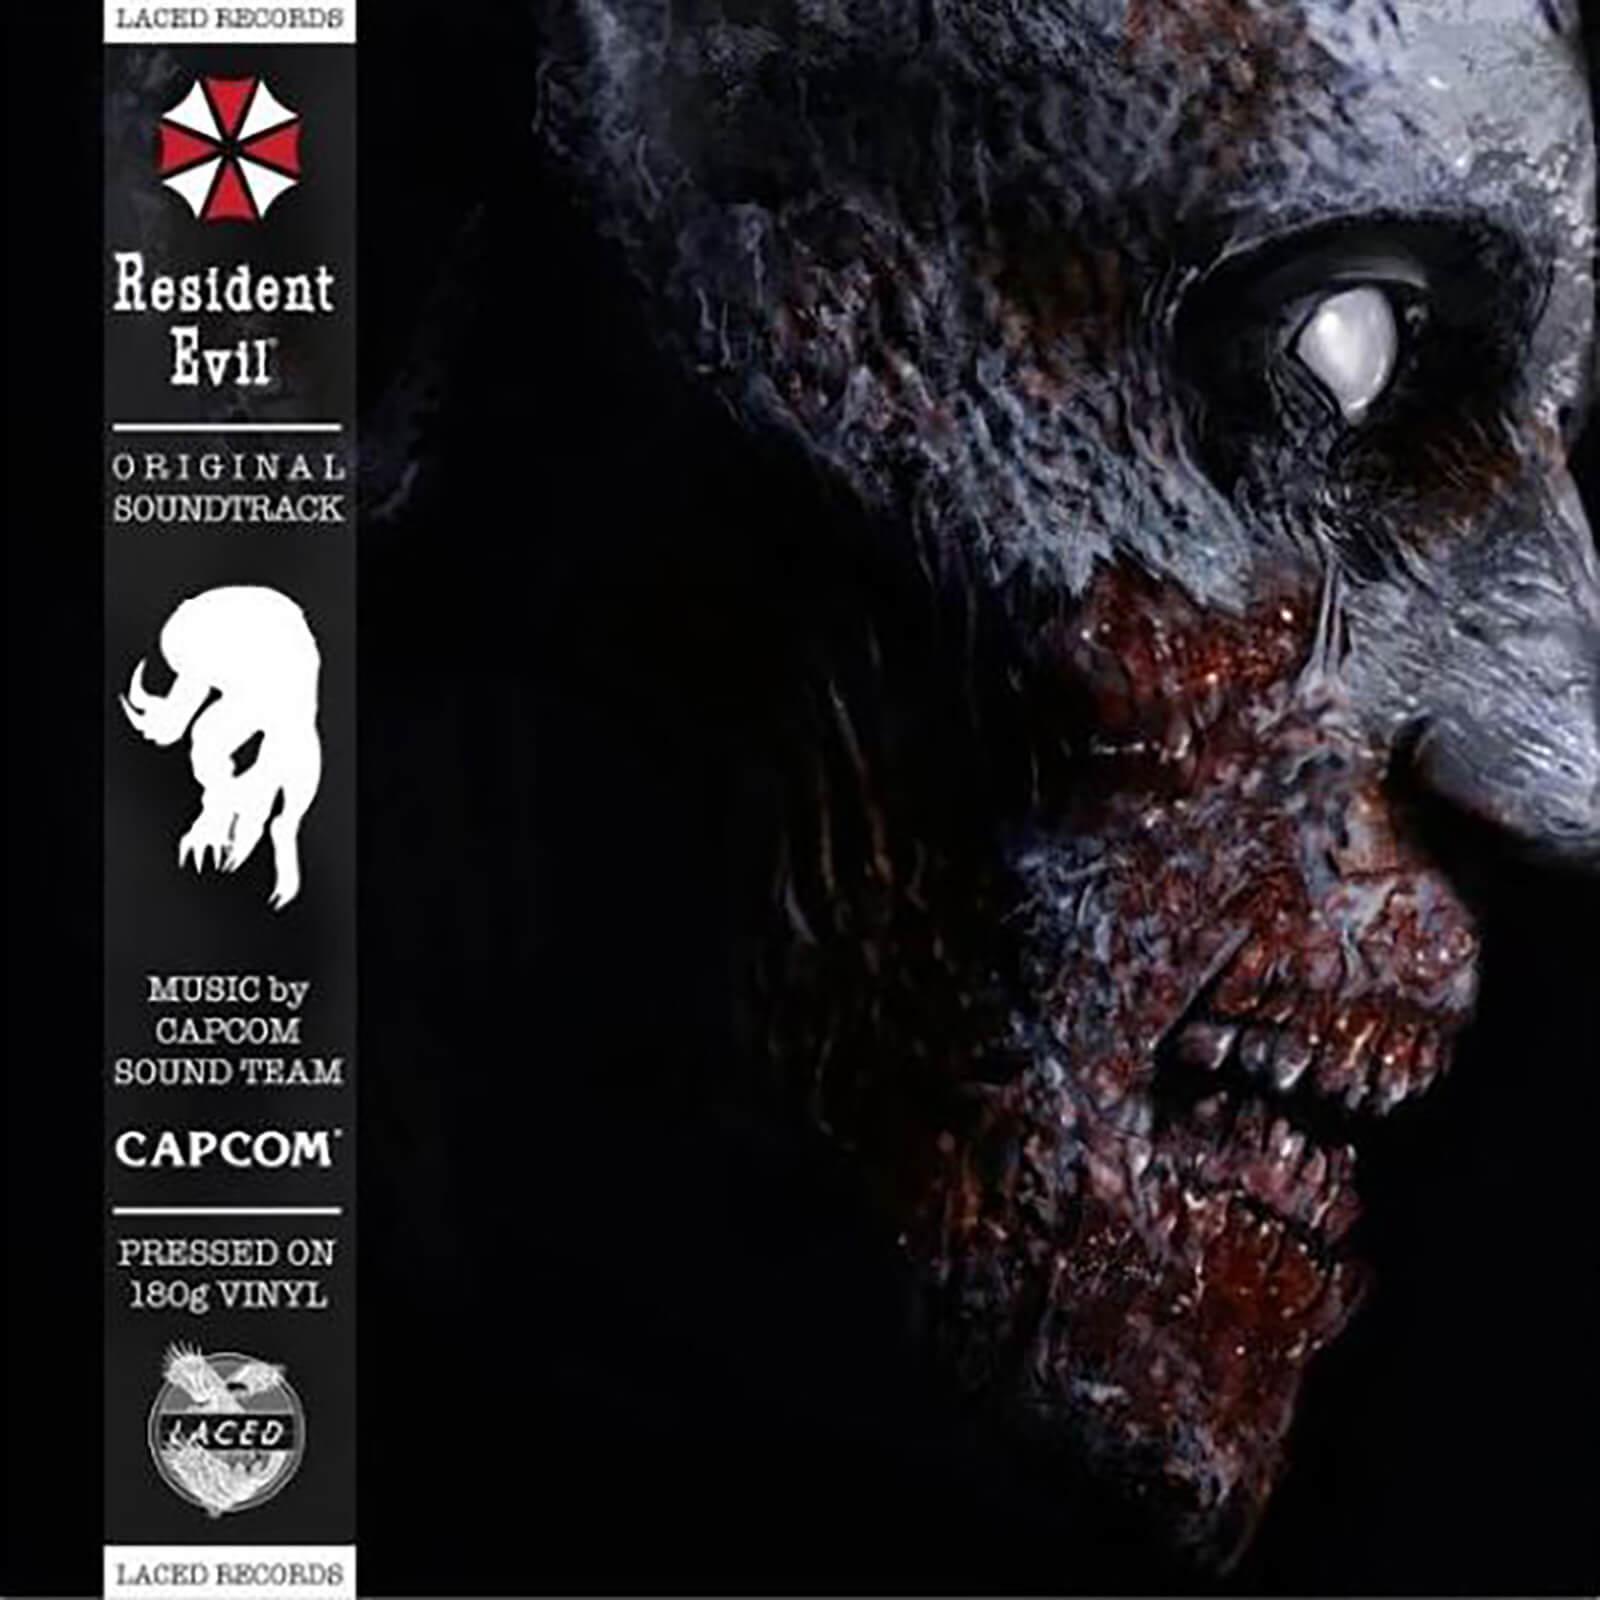 Laced Records - Resident Evil (Original Soundtrack) 2xLP für 41,99€